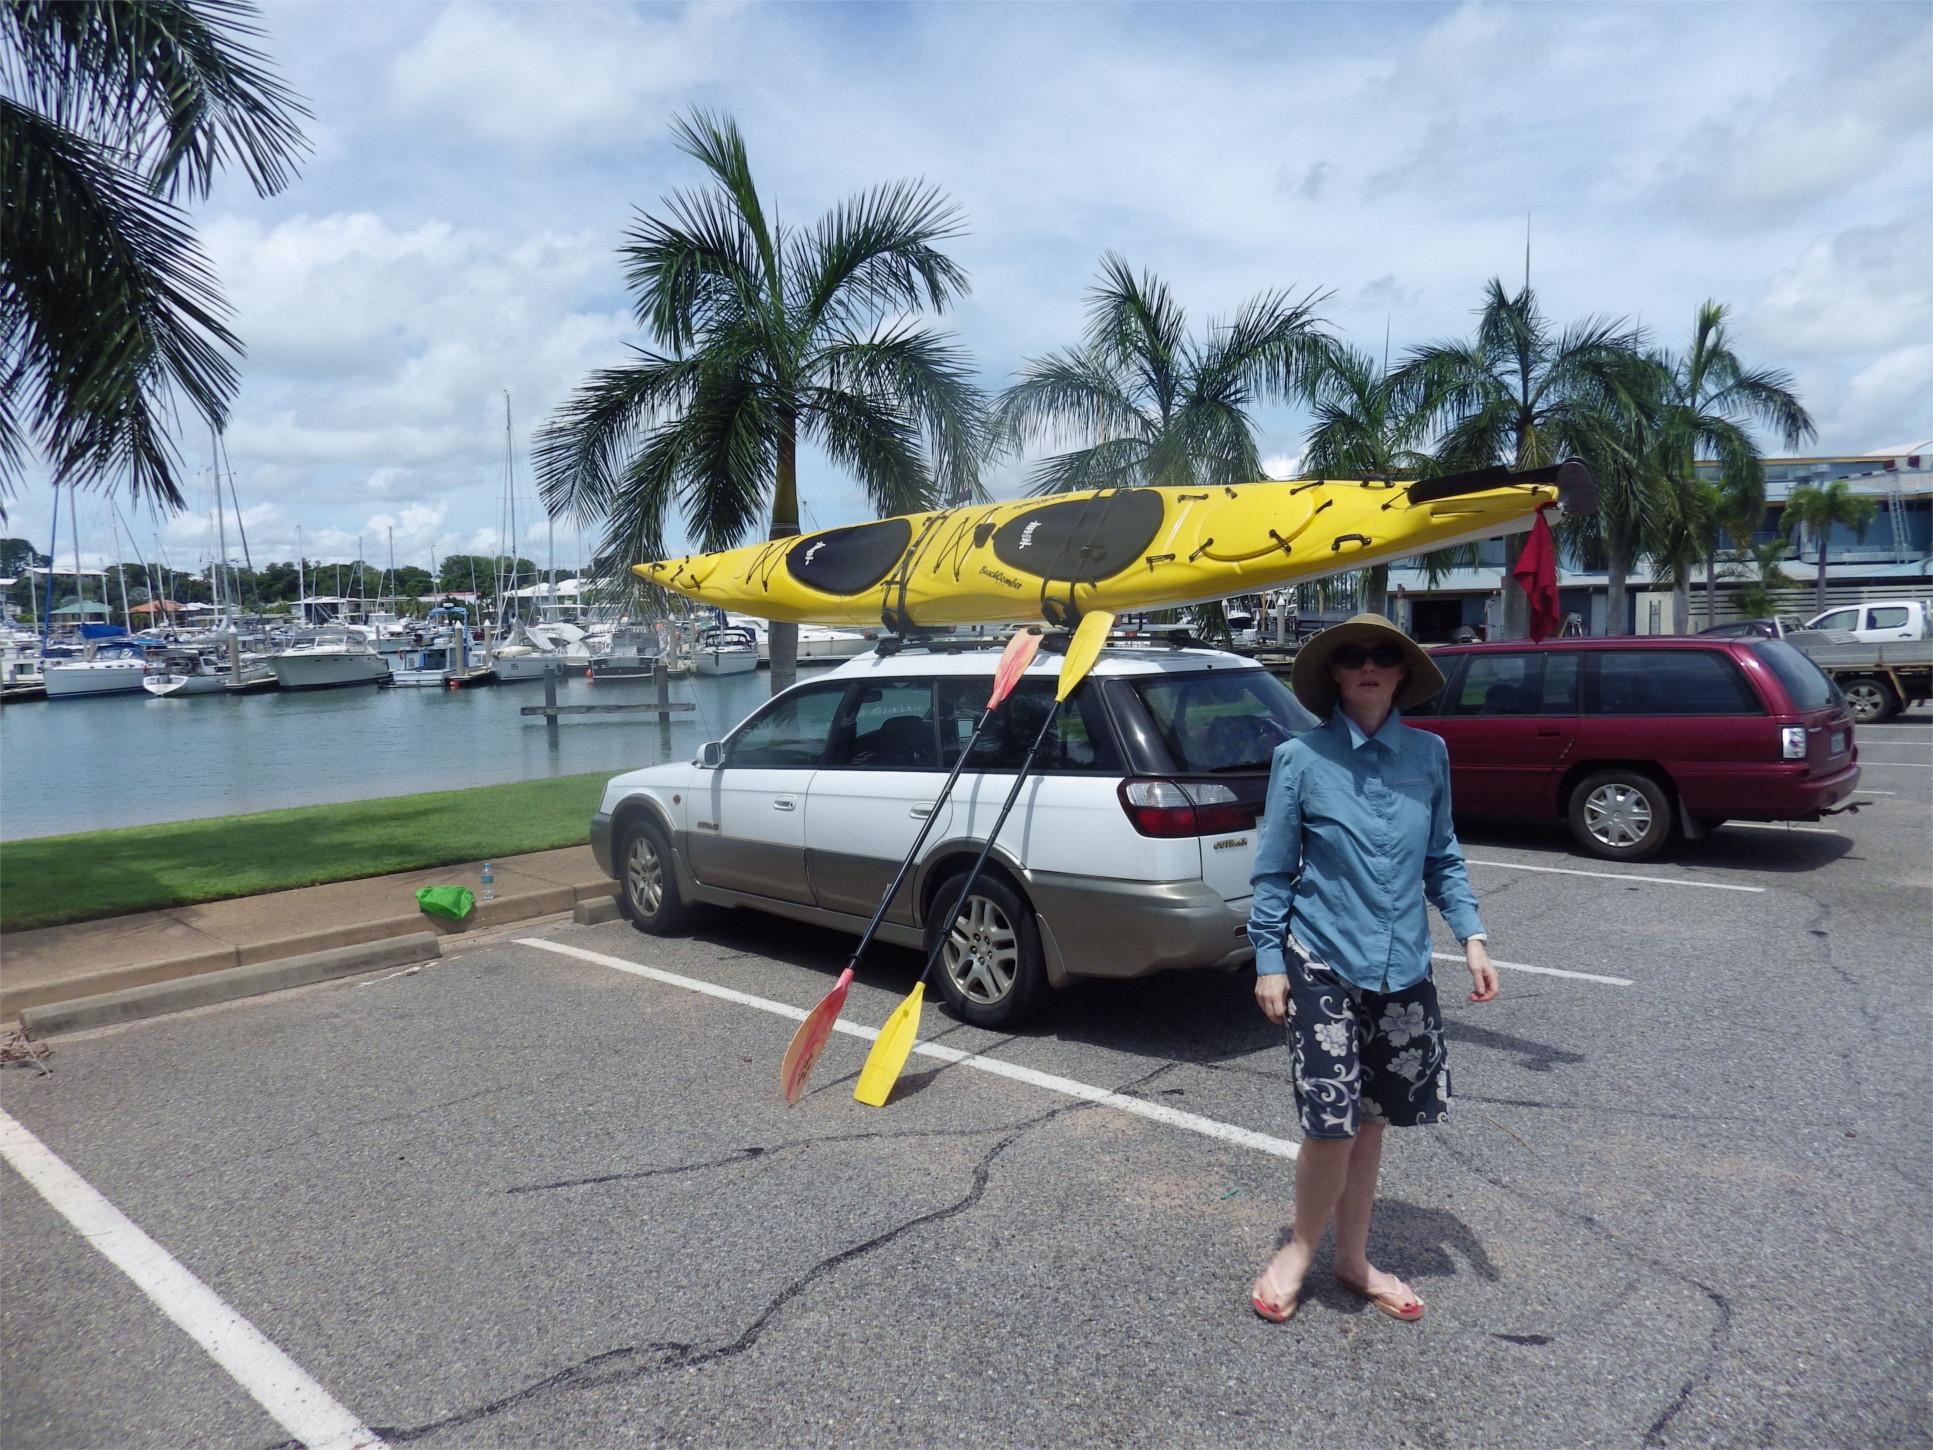 Cullen Bay kayak wander